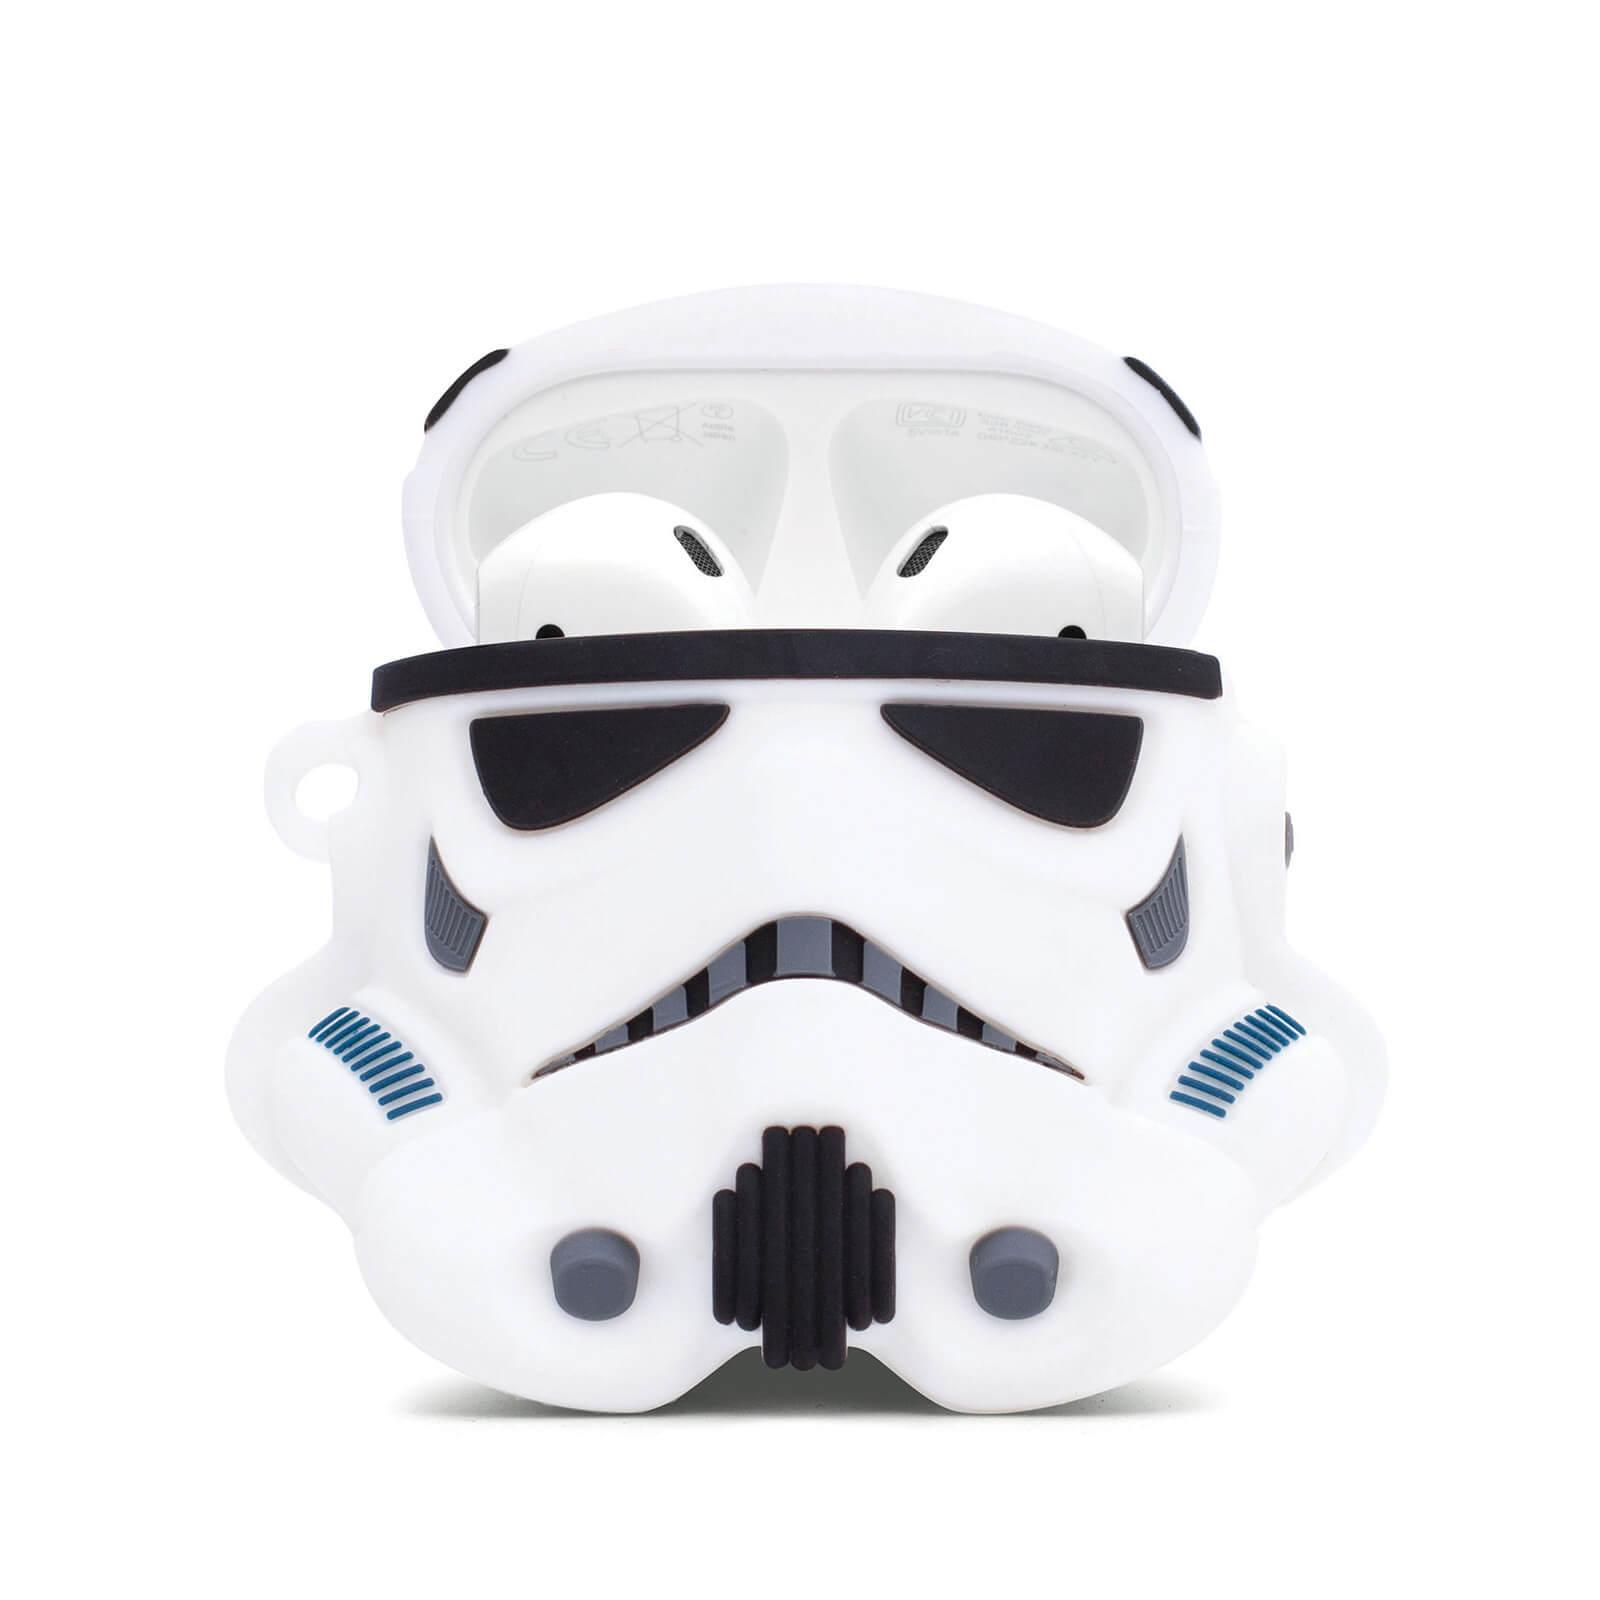 Image of Stormtrooper PowerSquad Air Pods Case